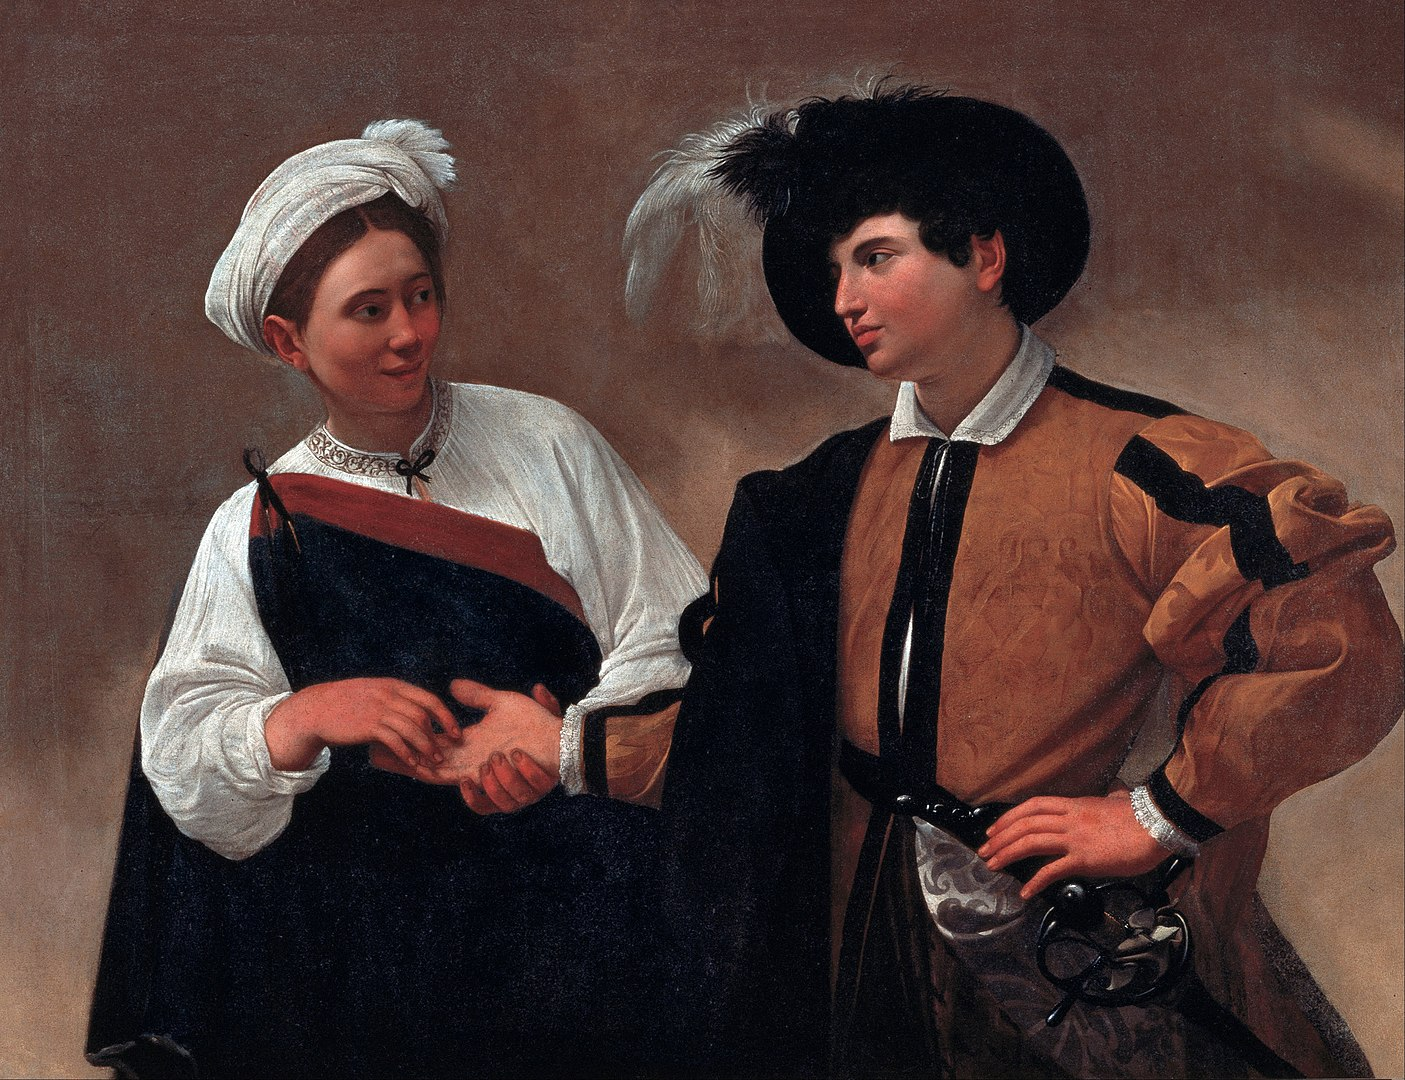 1405px-Caravaggio_(Michelangelo_Merisi)_-_Good_Luck_-_Google_Art_Project